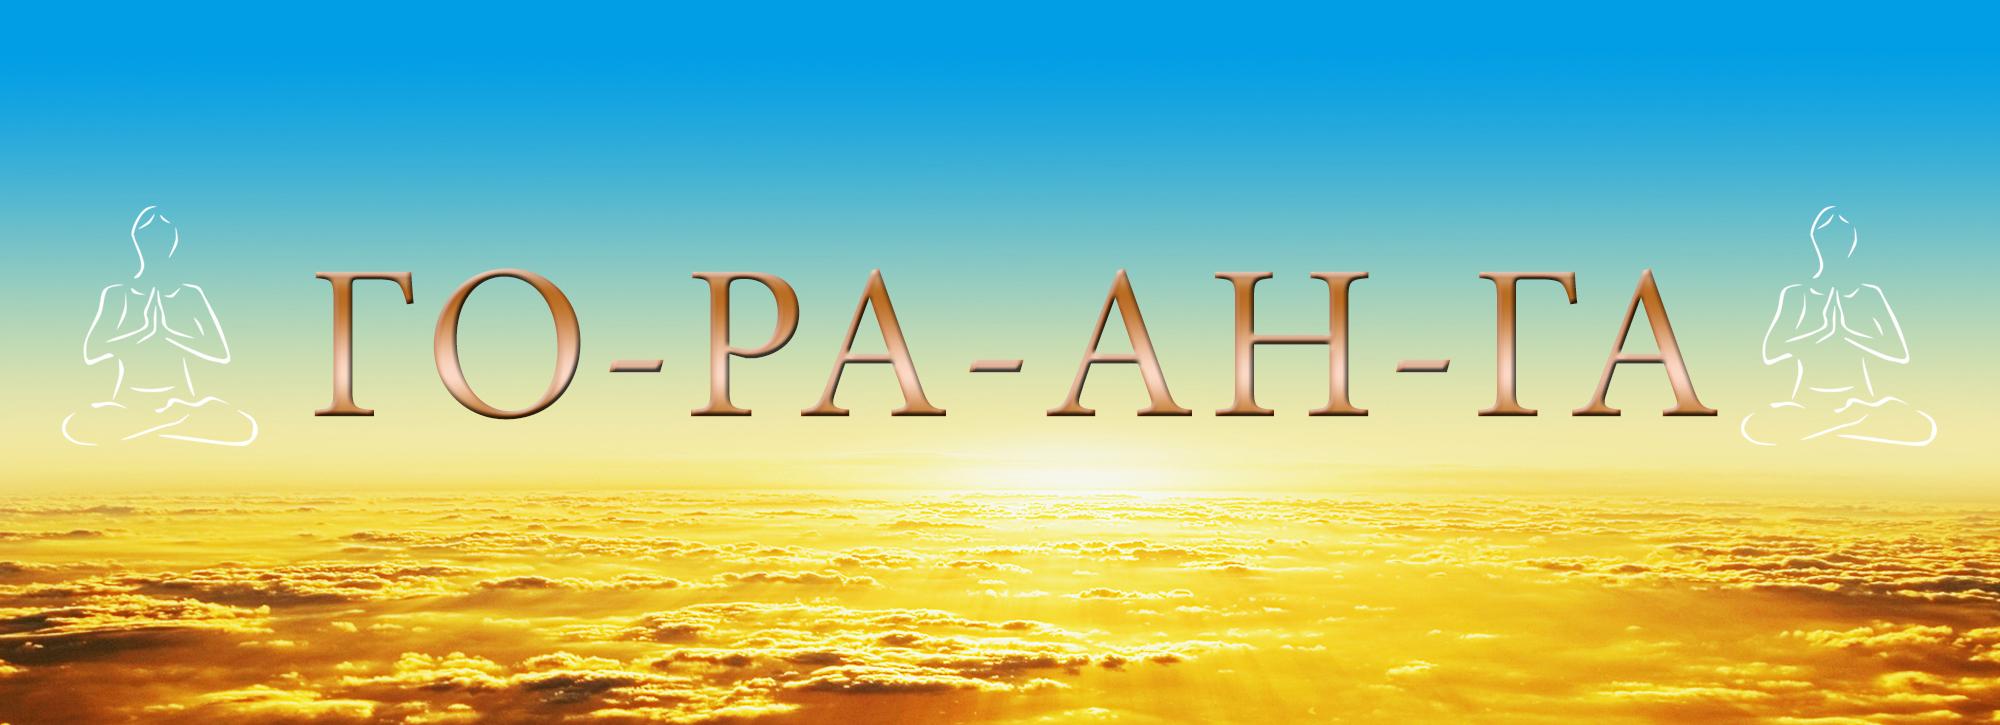 Медитация с мантрой ГО-РА-АН-ГА